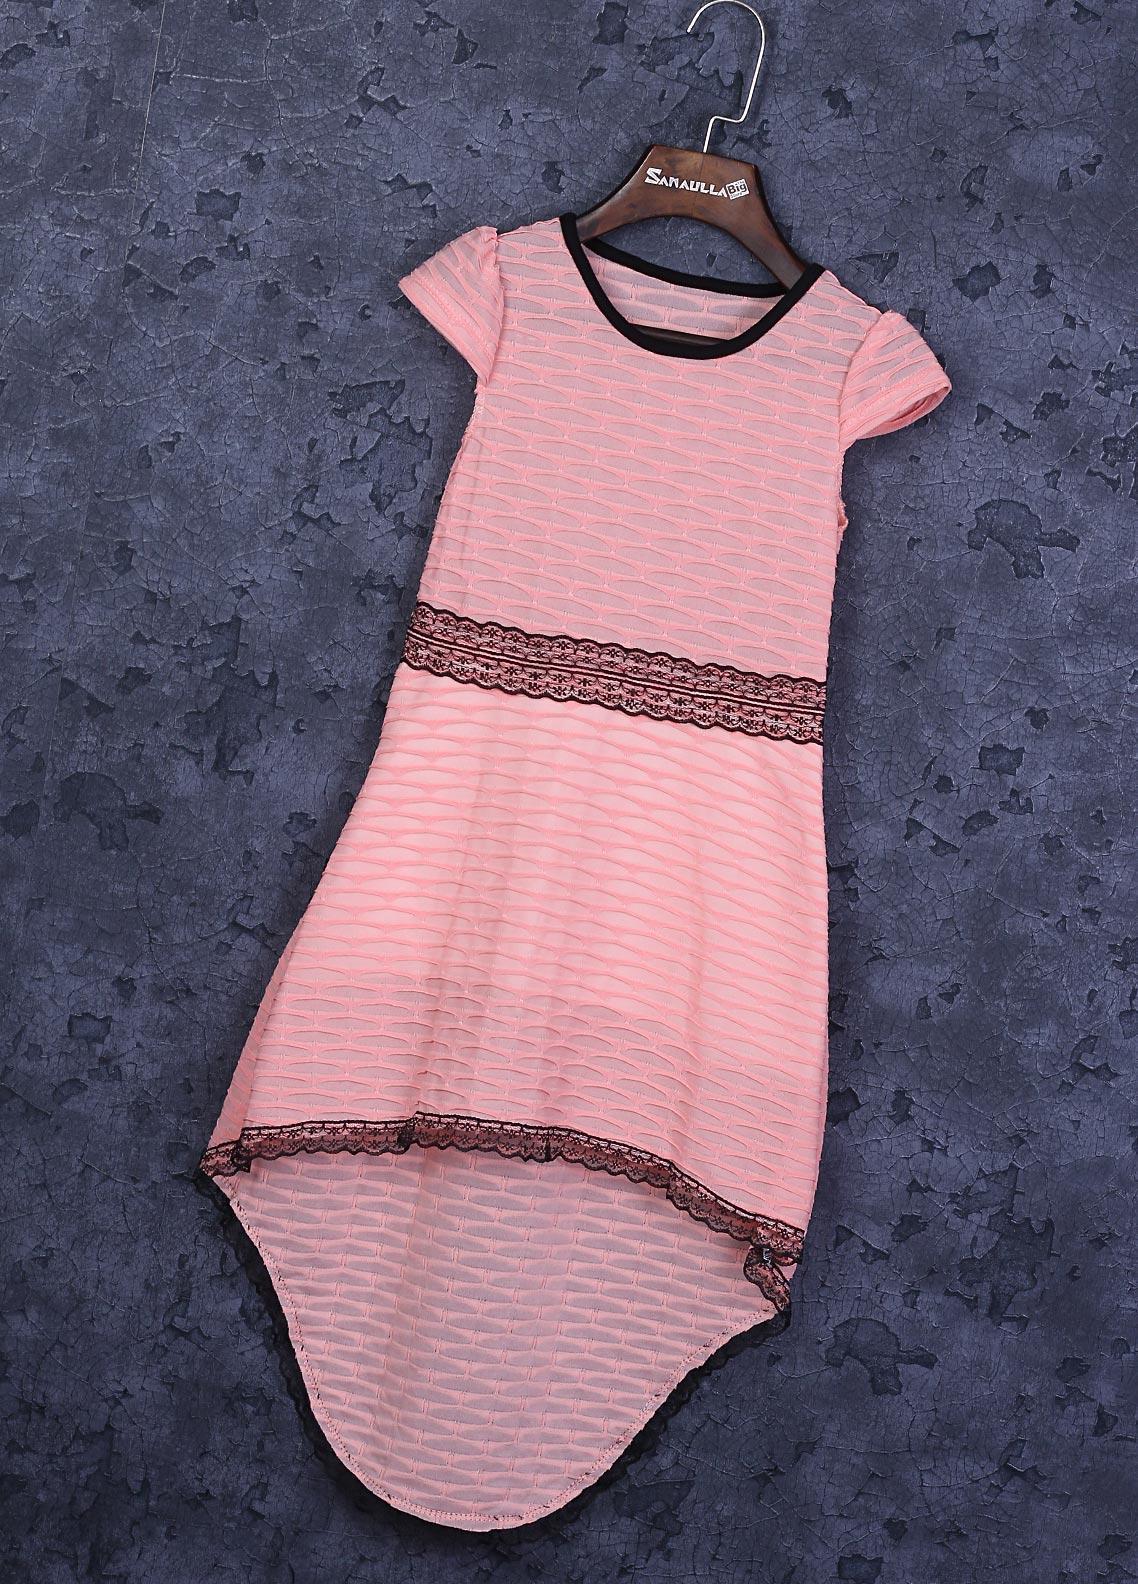 Sanaulla Exclusive Range Cotton Fancy Girls Frocks -  22457-2 Light Pink